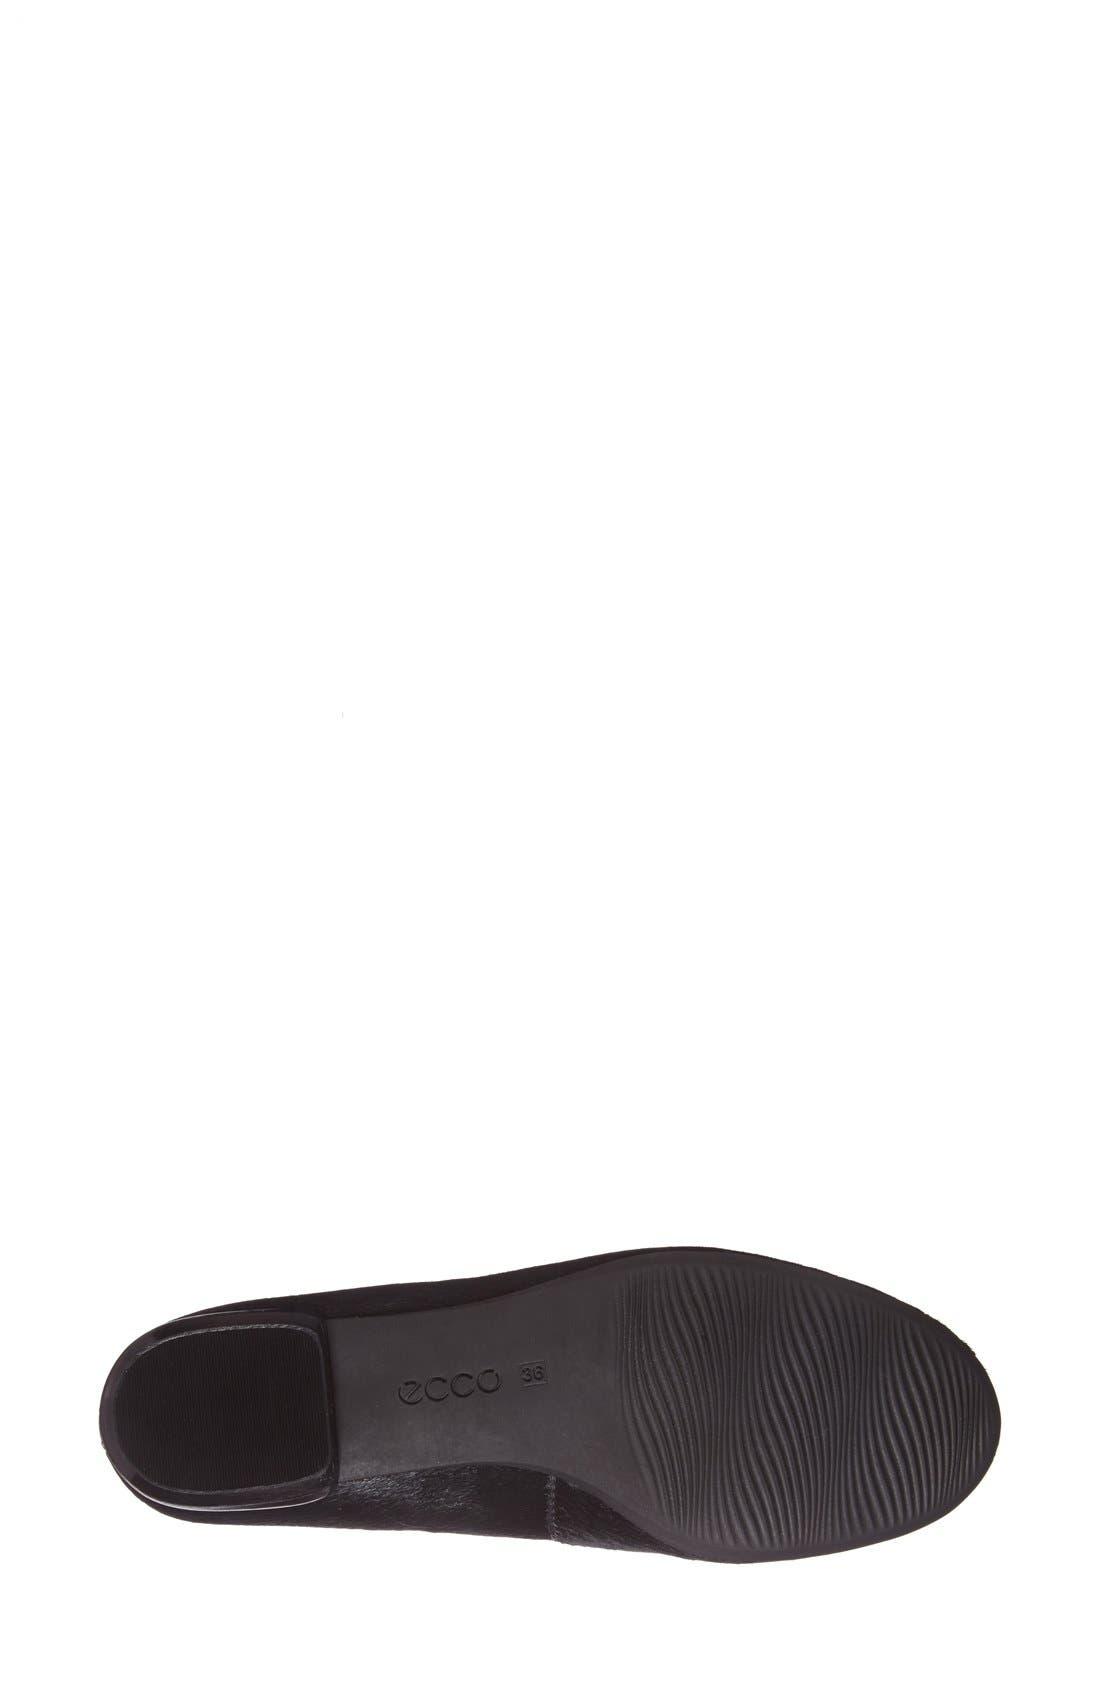 ECCO, 'Perth' Calf Hair Loafer, Alternate thumbnail 2, color, 006